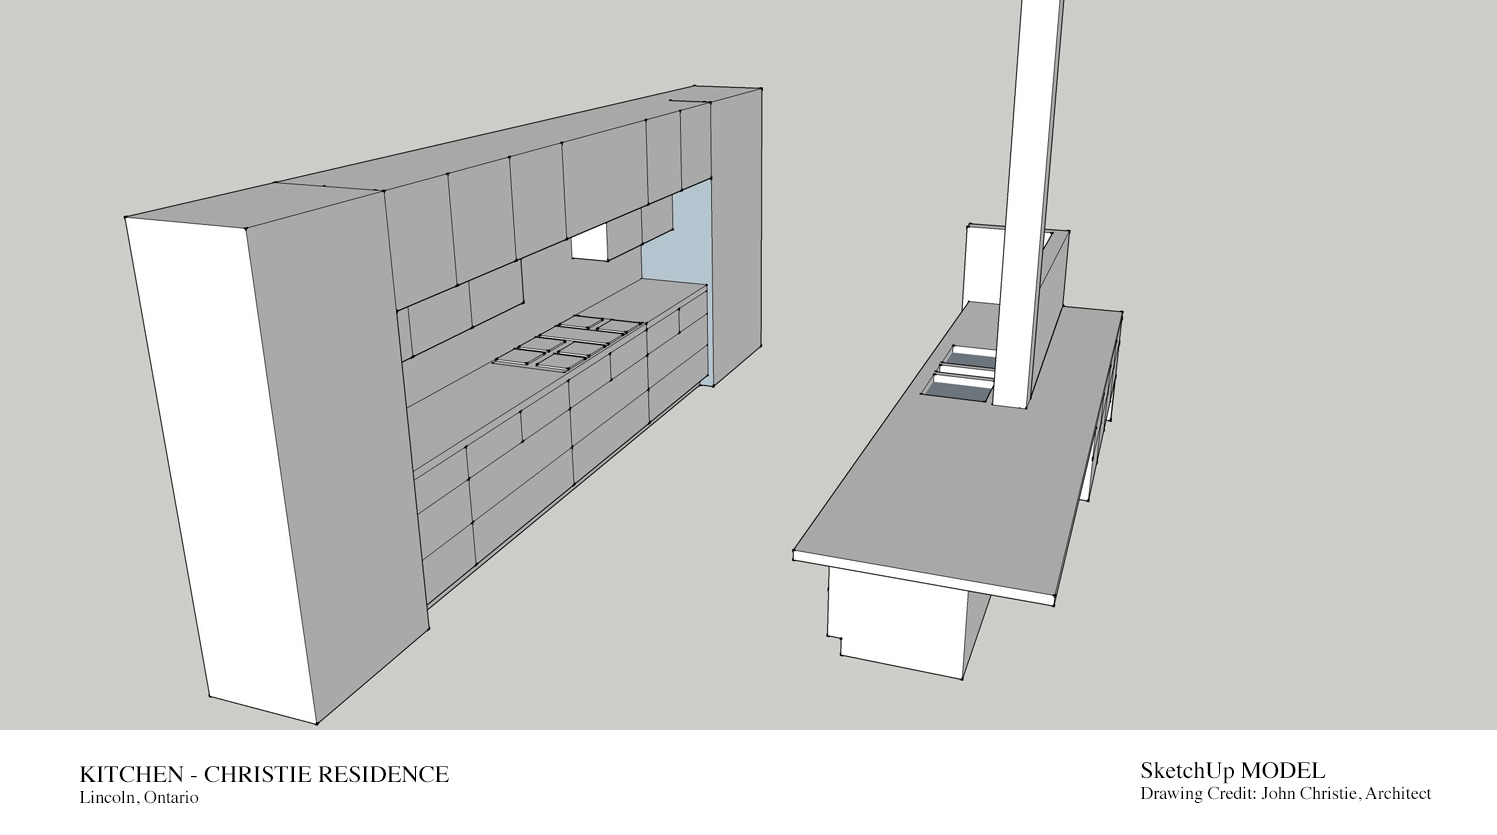 SketchUp Model Architect